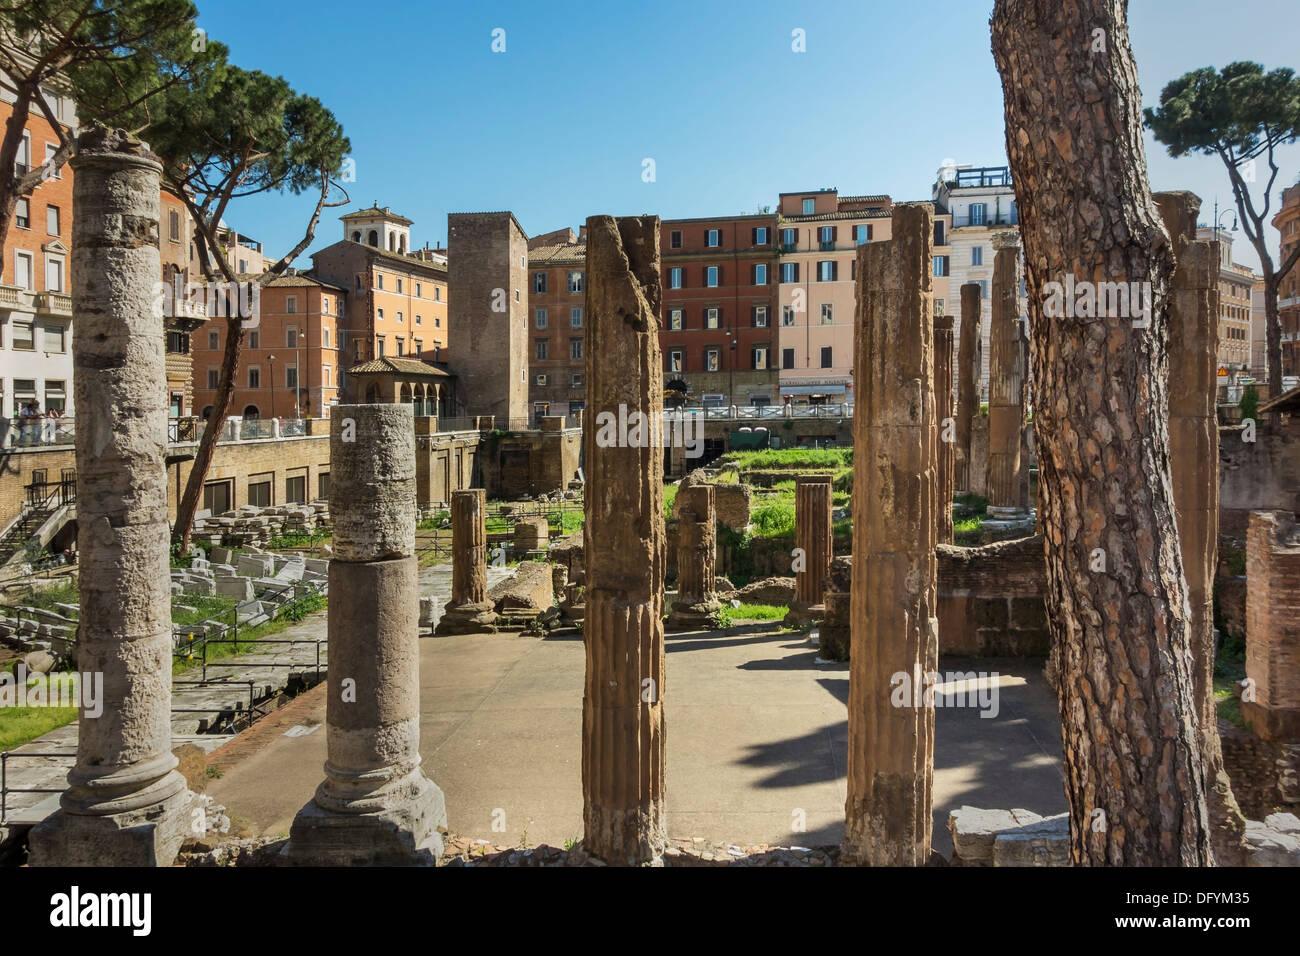 Largo di Torre Argentina is a square in Rome, Lazio, Italy, Europe - Stock Image